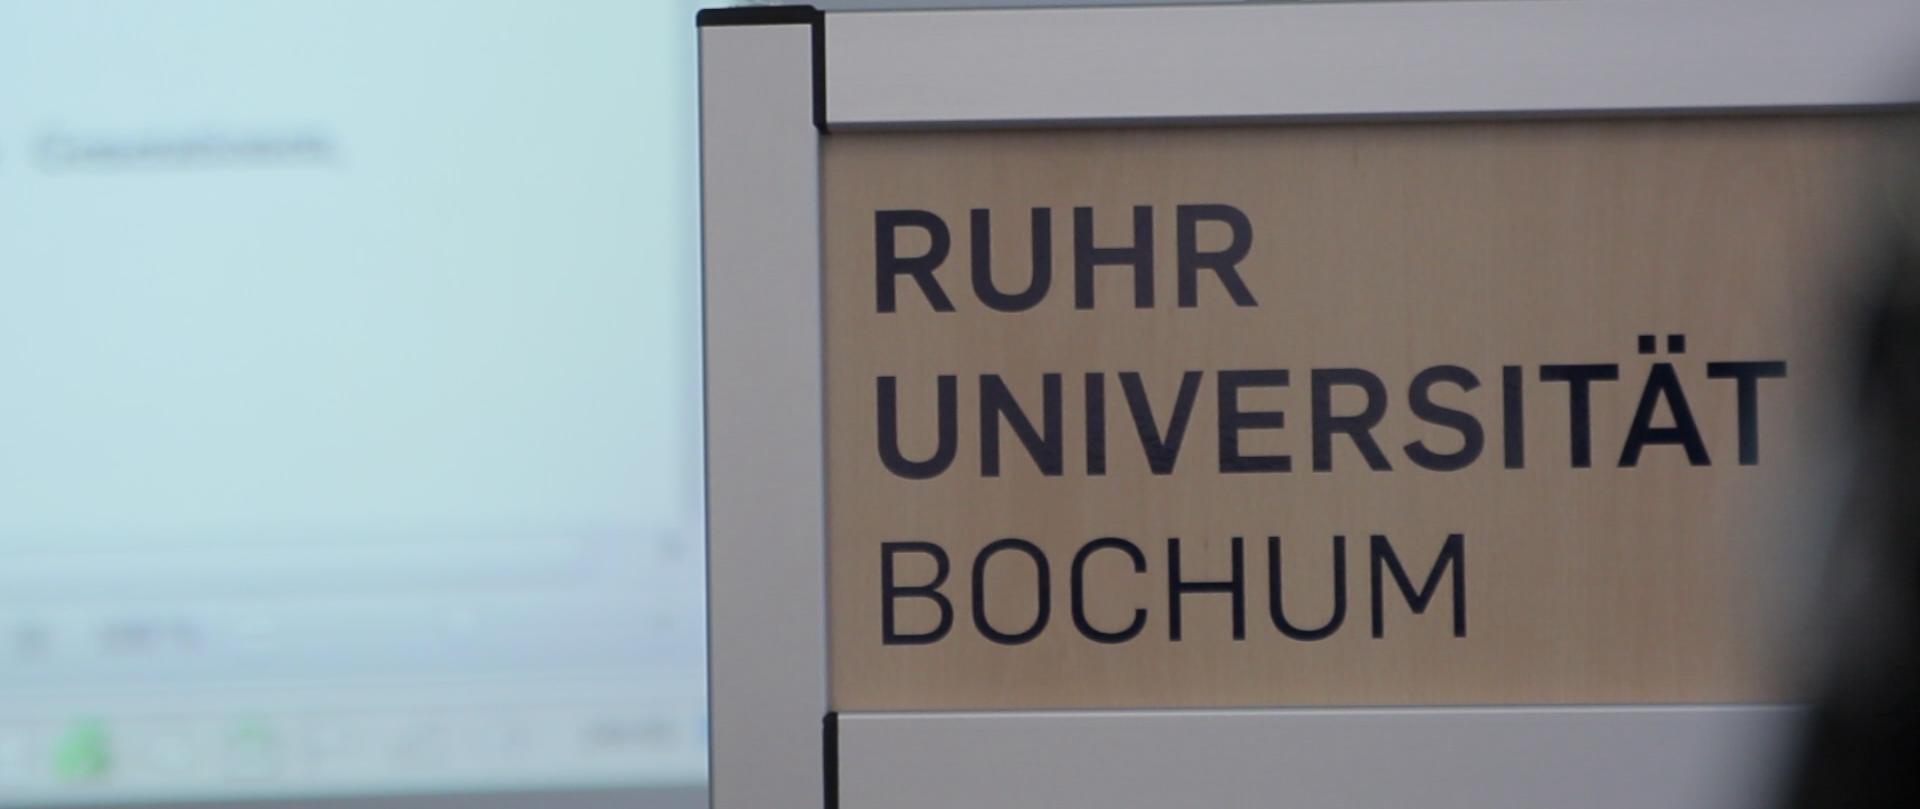 Ruhr University Logo